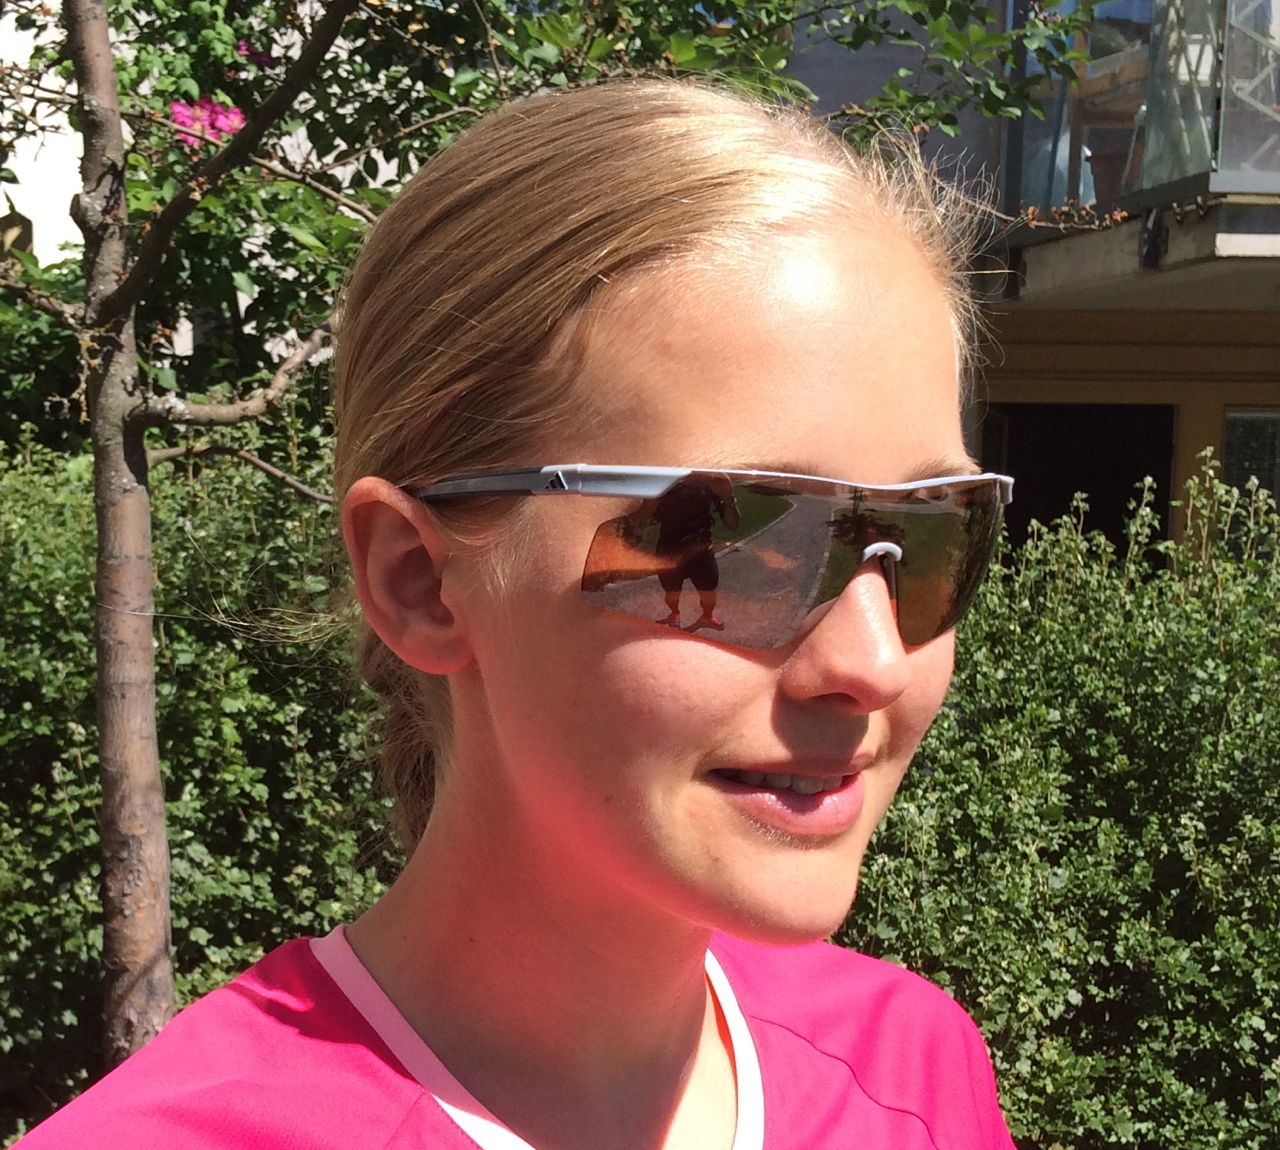 Adidas sun glasses